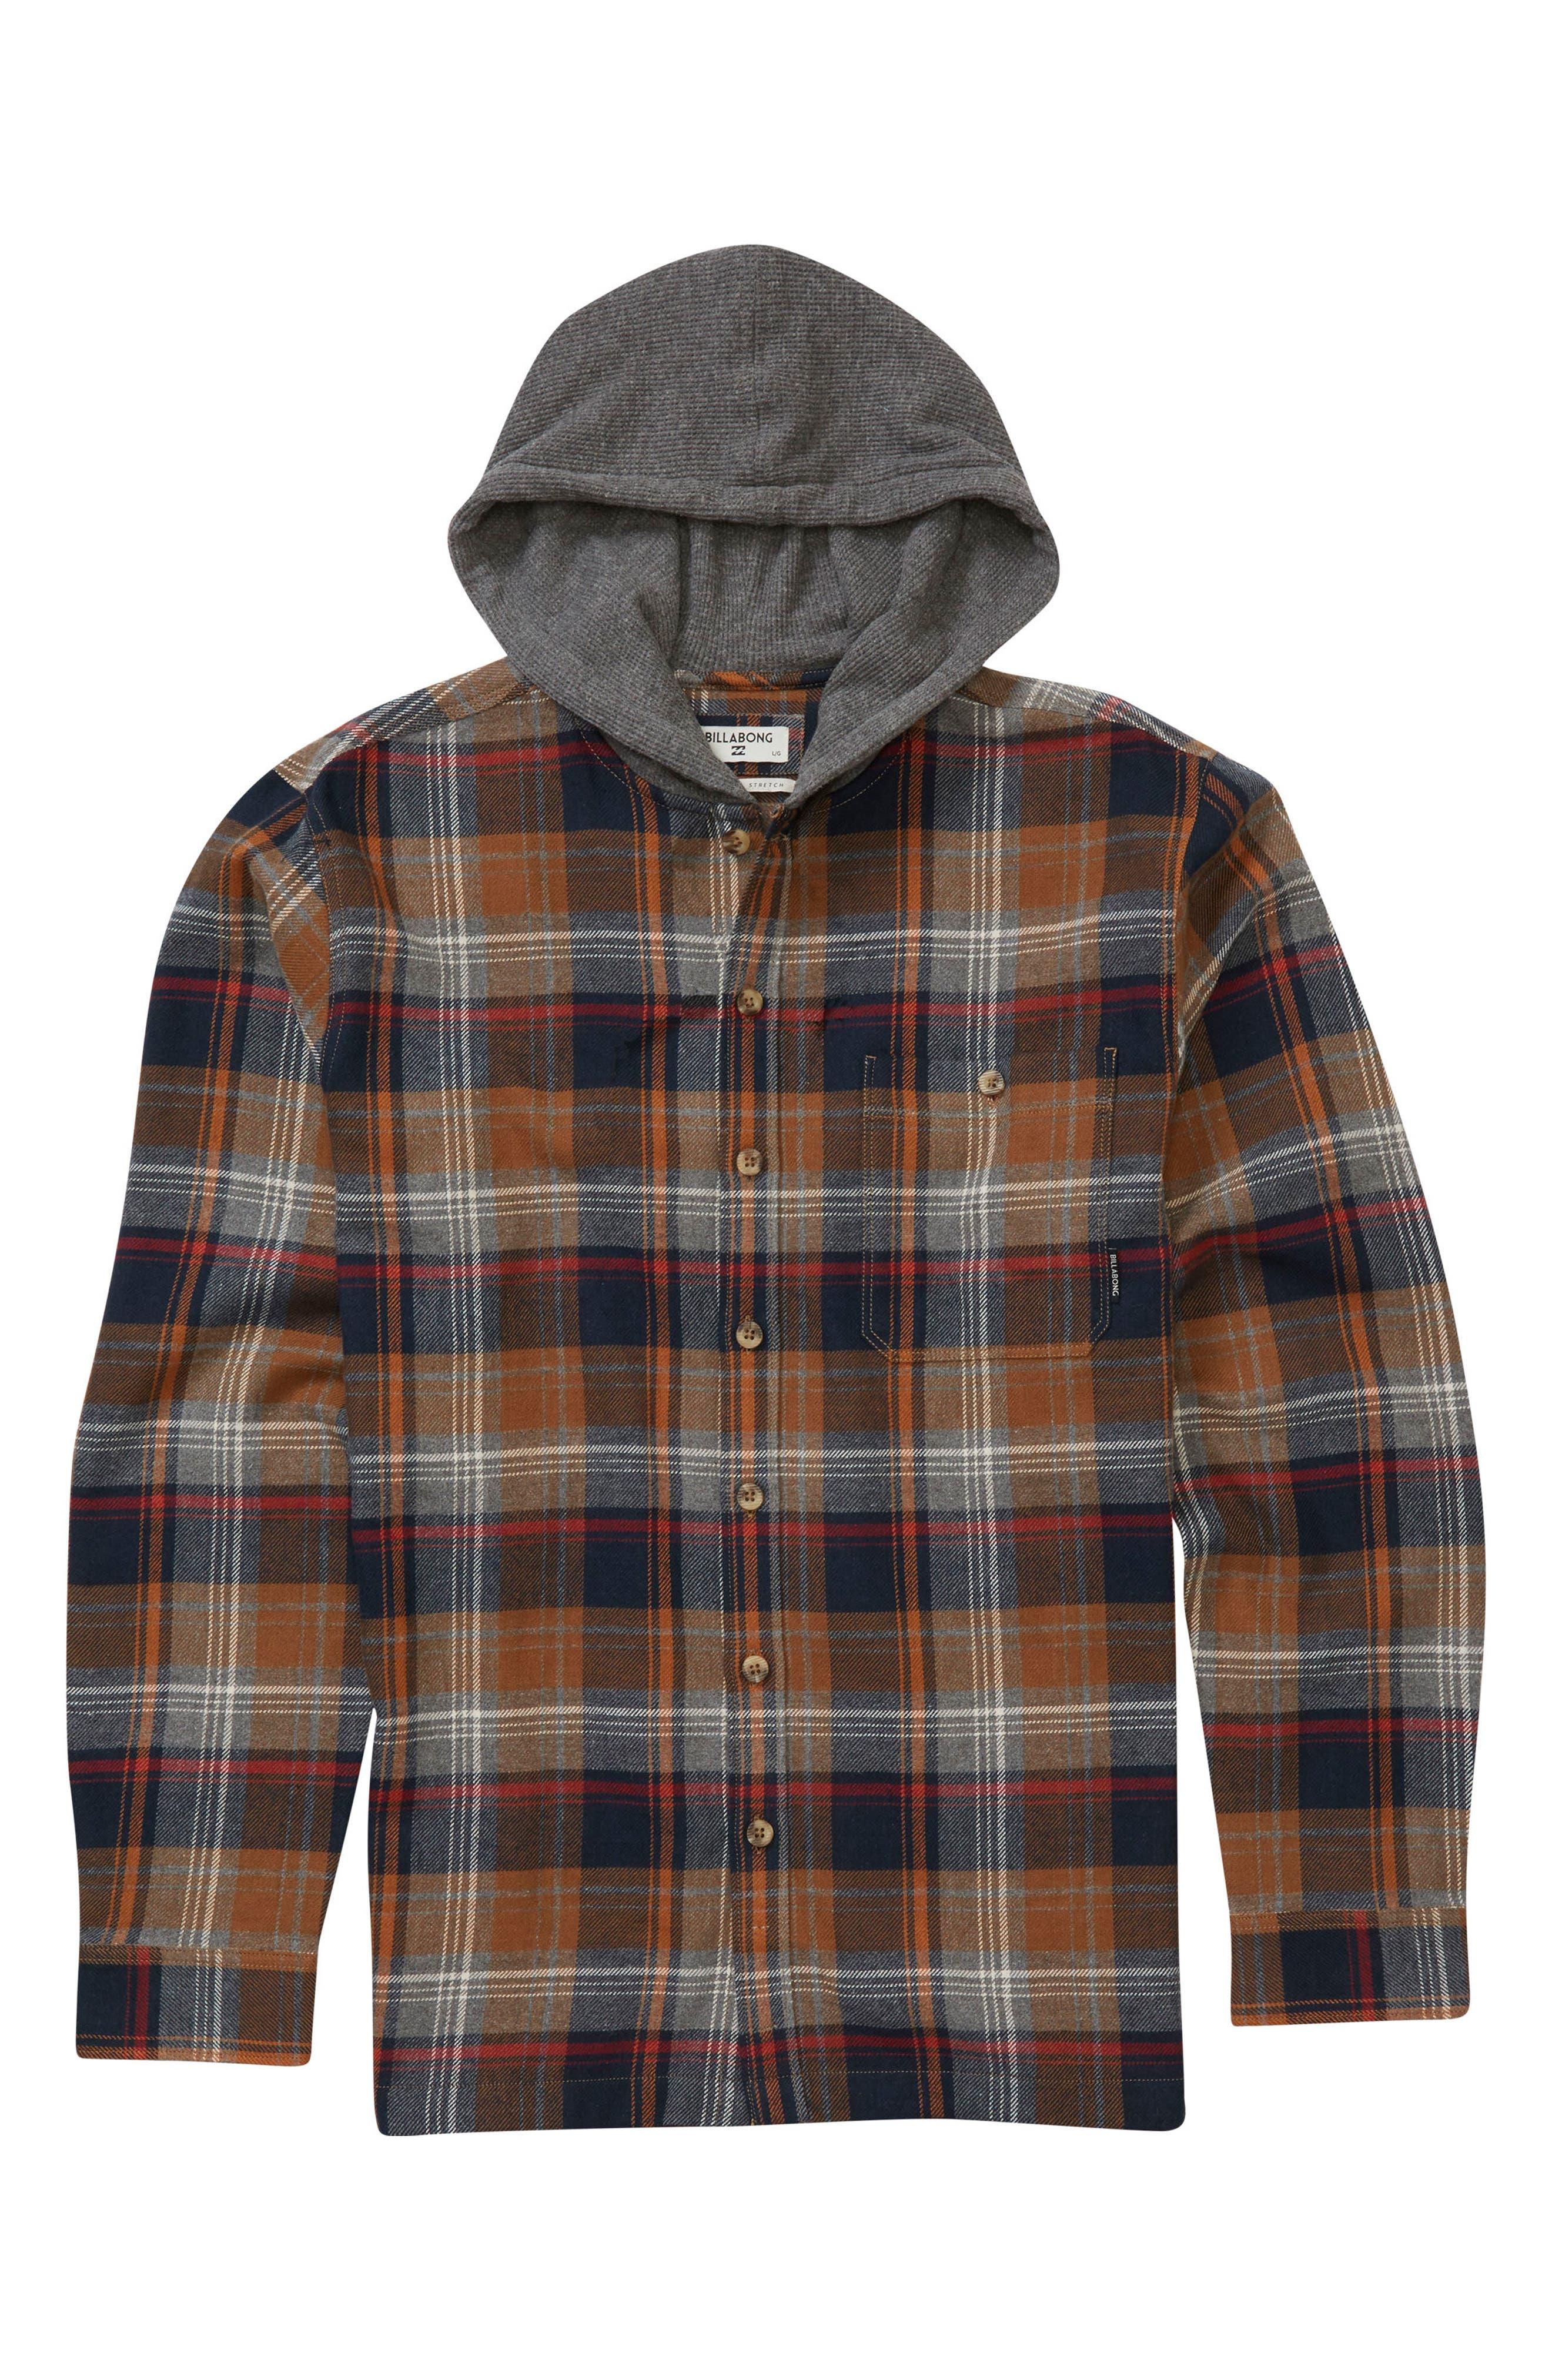 Baja Hooded Flannel,                         Main,                         color, 204